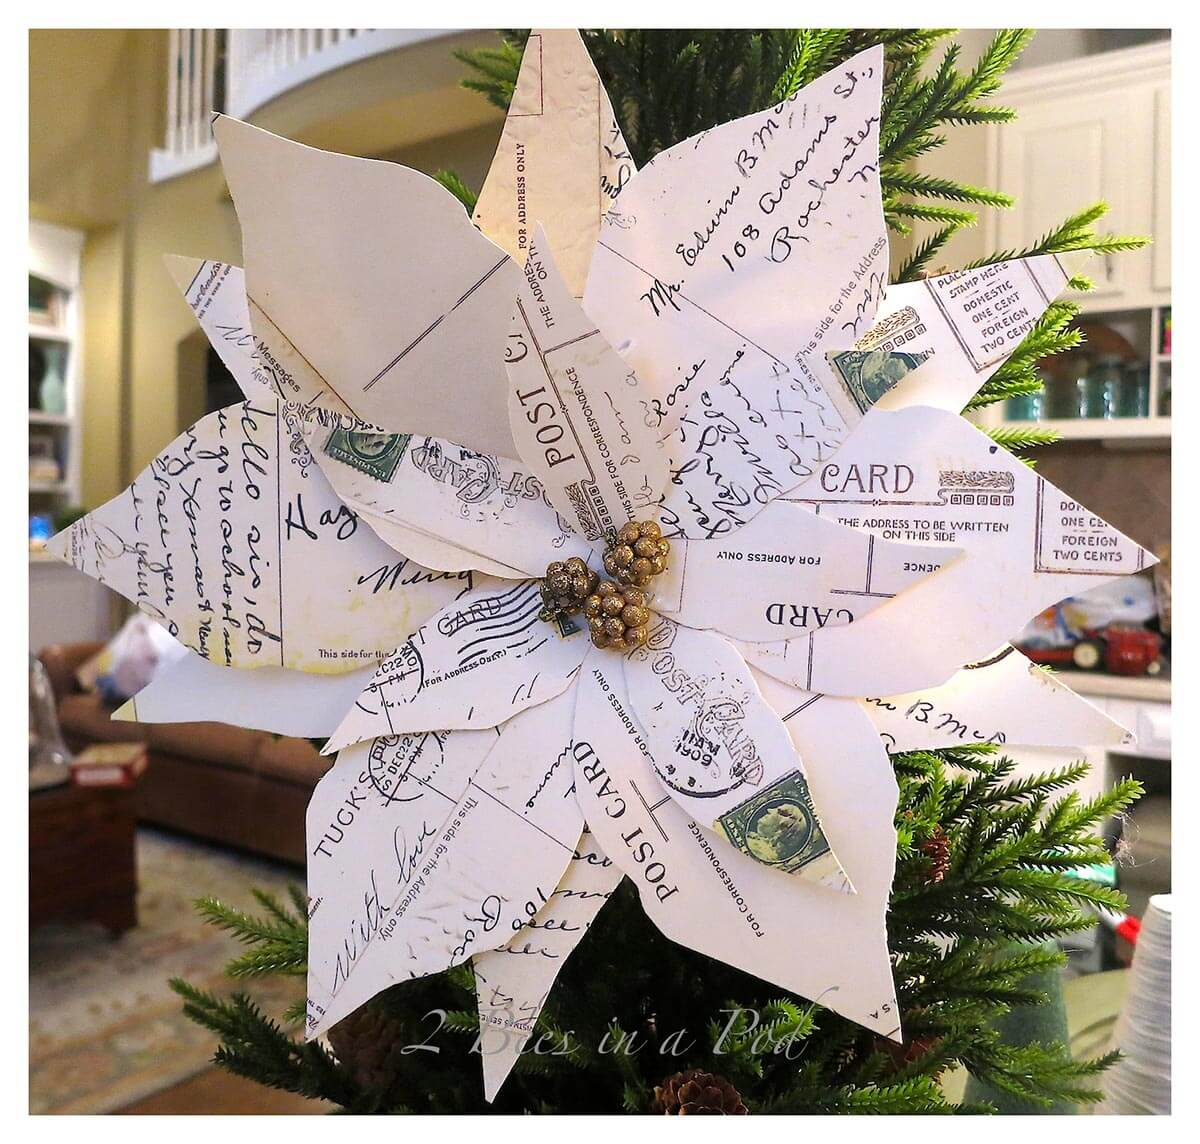 Beautiful Post Card Poinsettia Vintage Christmas Decor